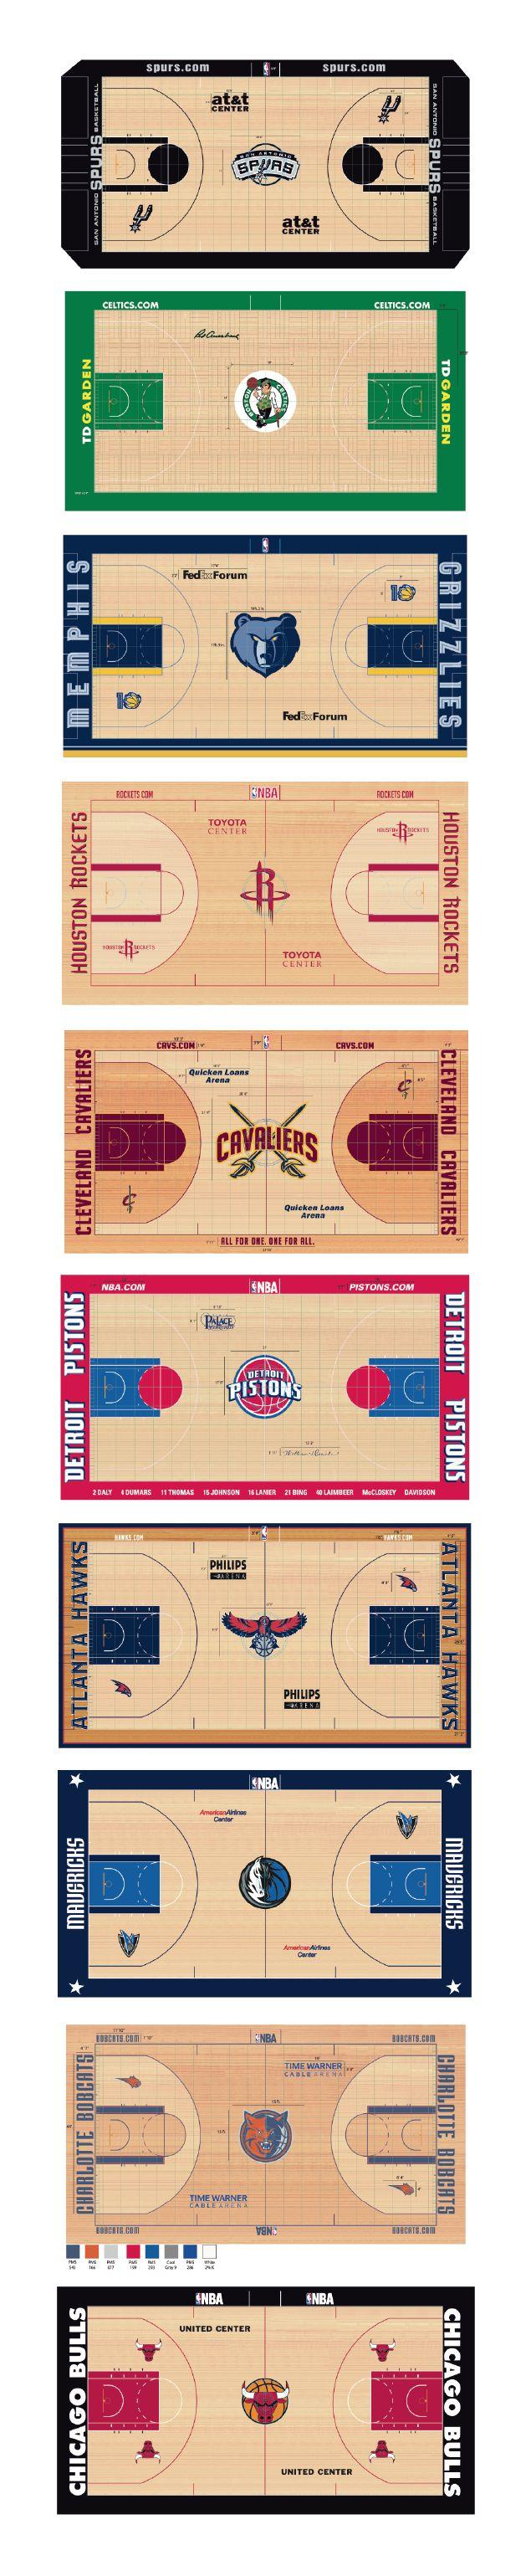 NBA - http://www.laboiteverte.fr/design-des-terrains-de-basket-en-nba/